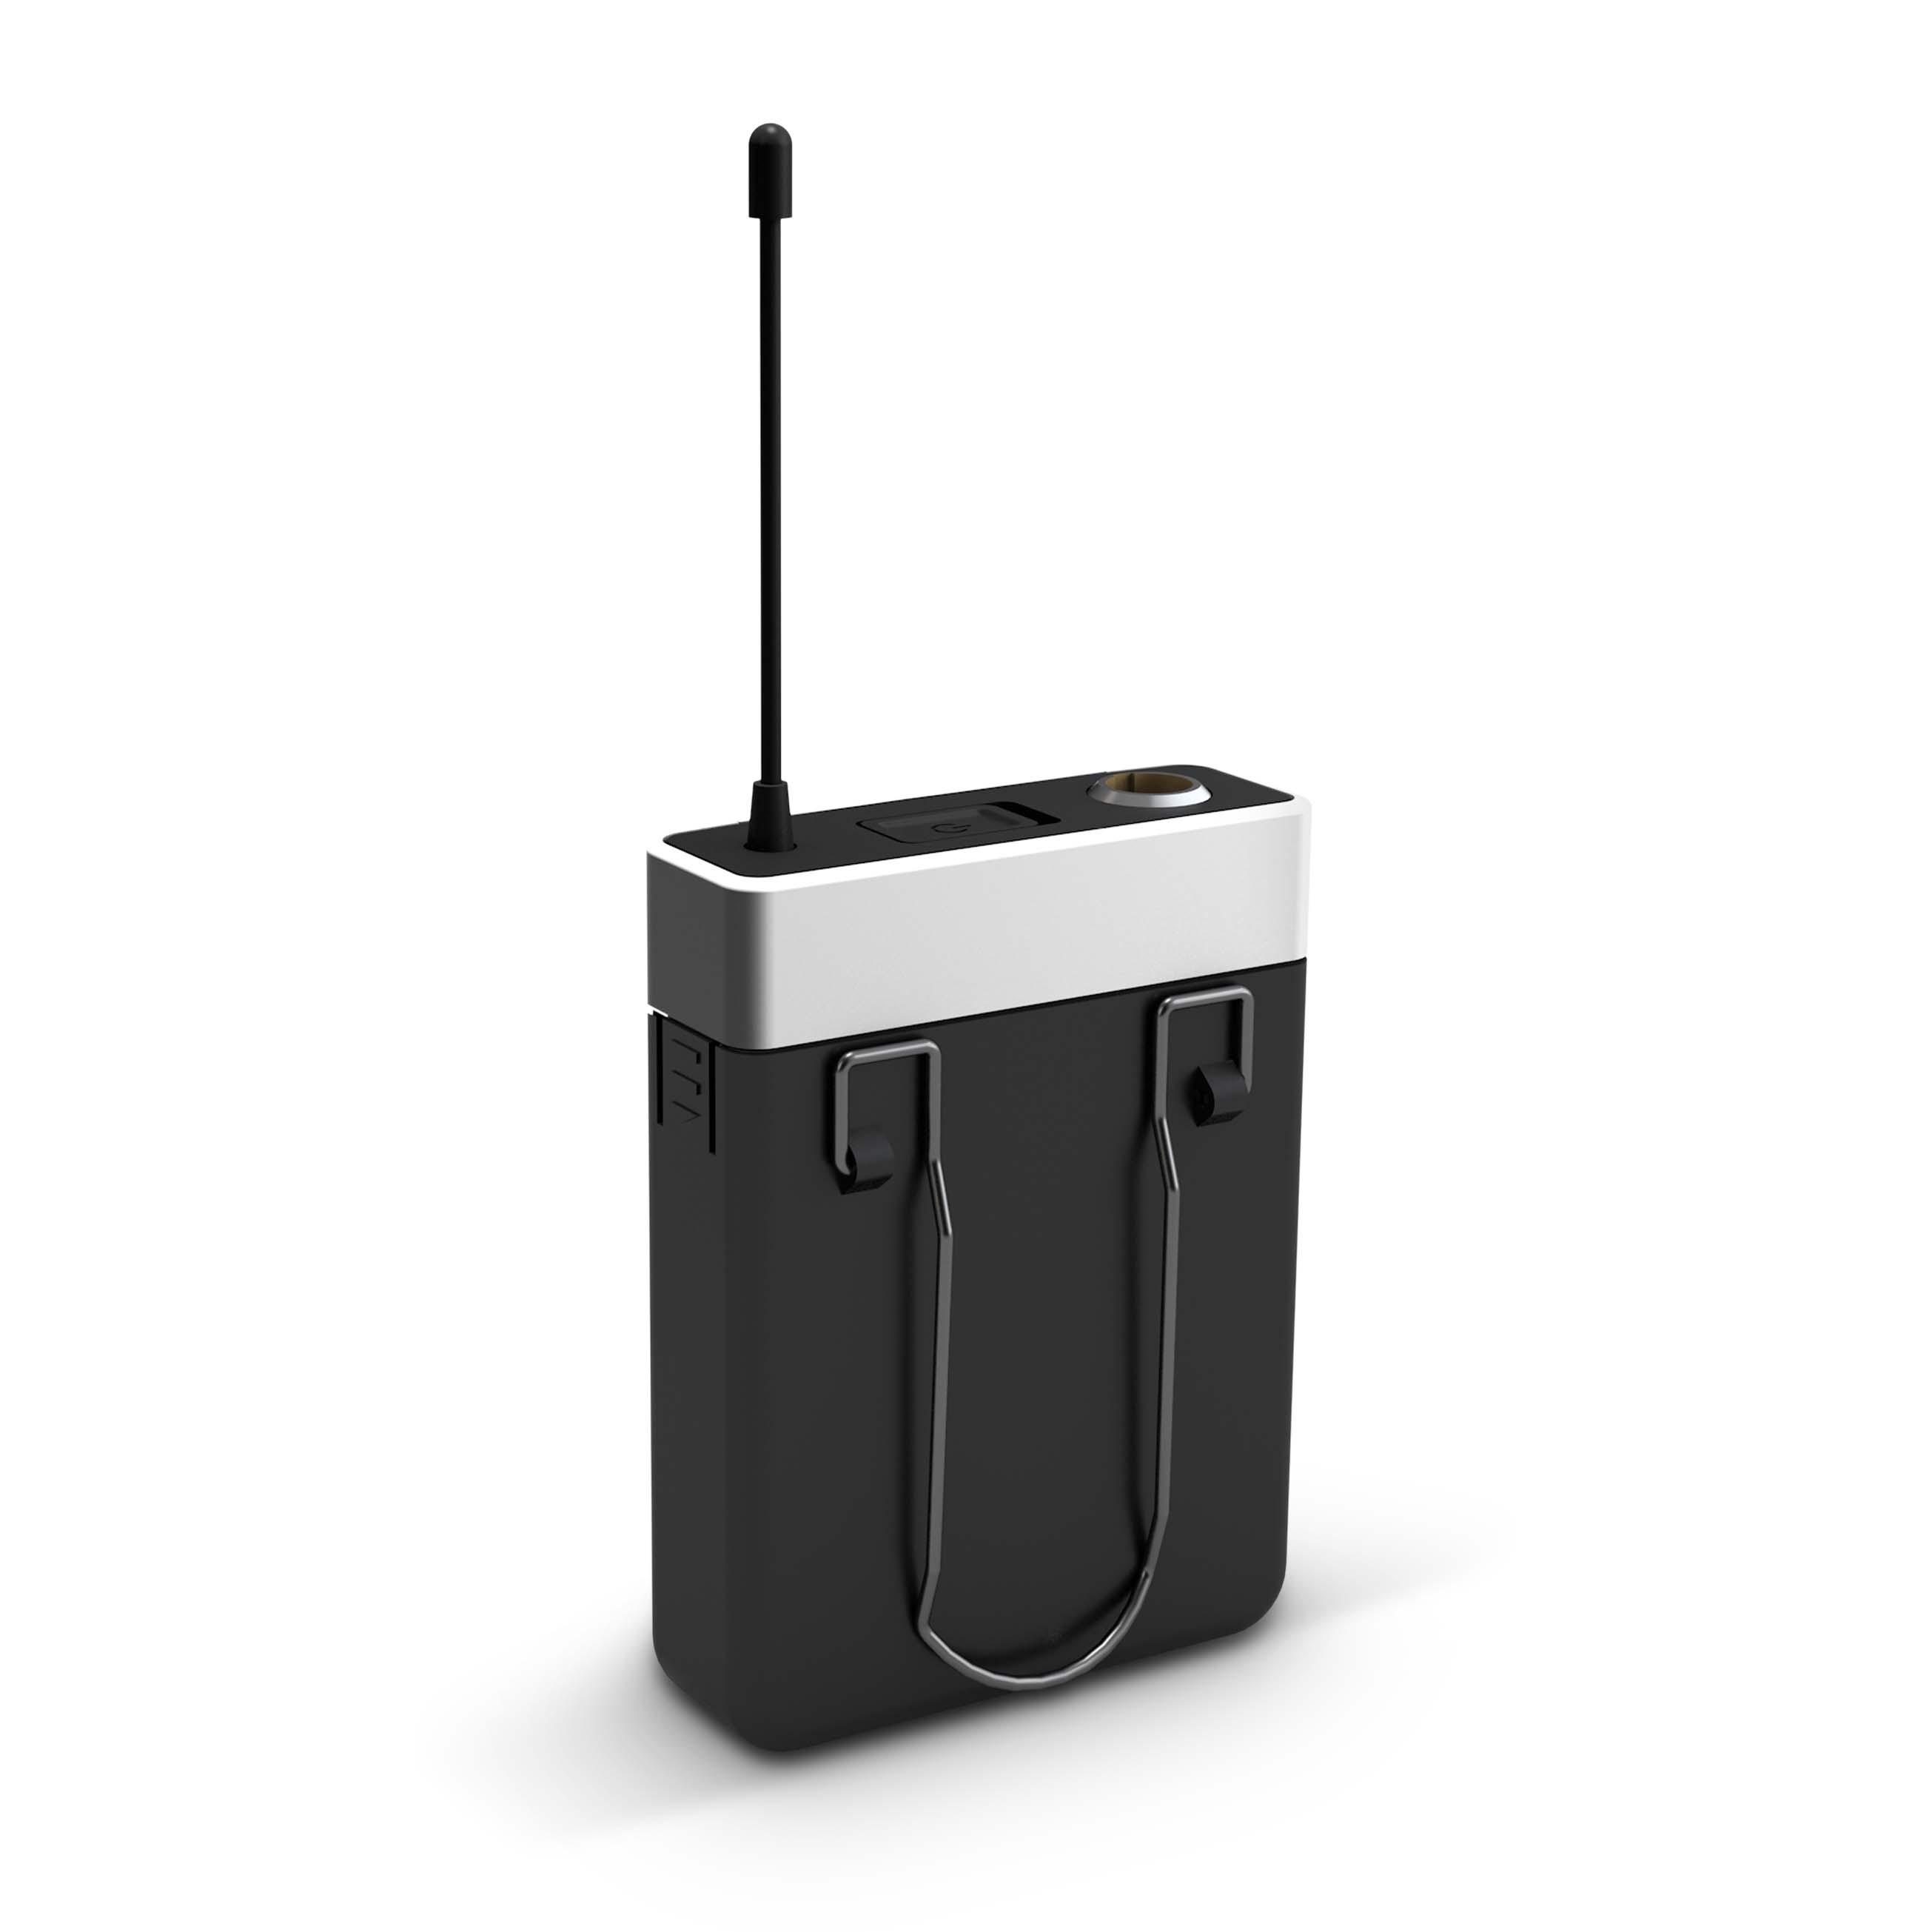 U506 UK BPH 2 Funkmikrofon System mit 2 x Bodypack und 2 x Headset